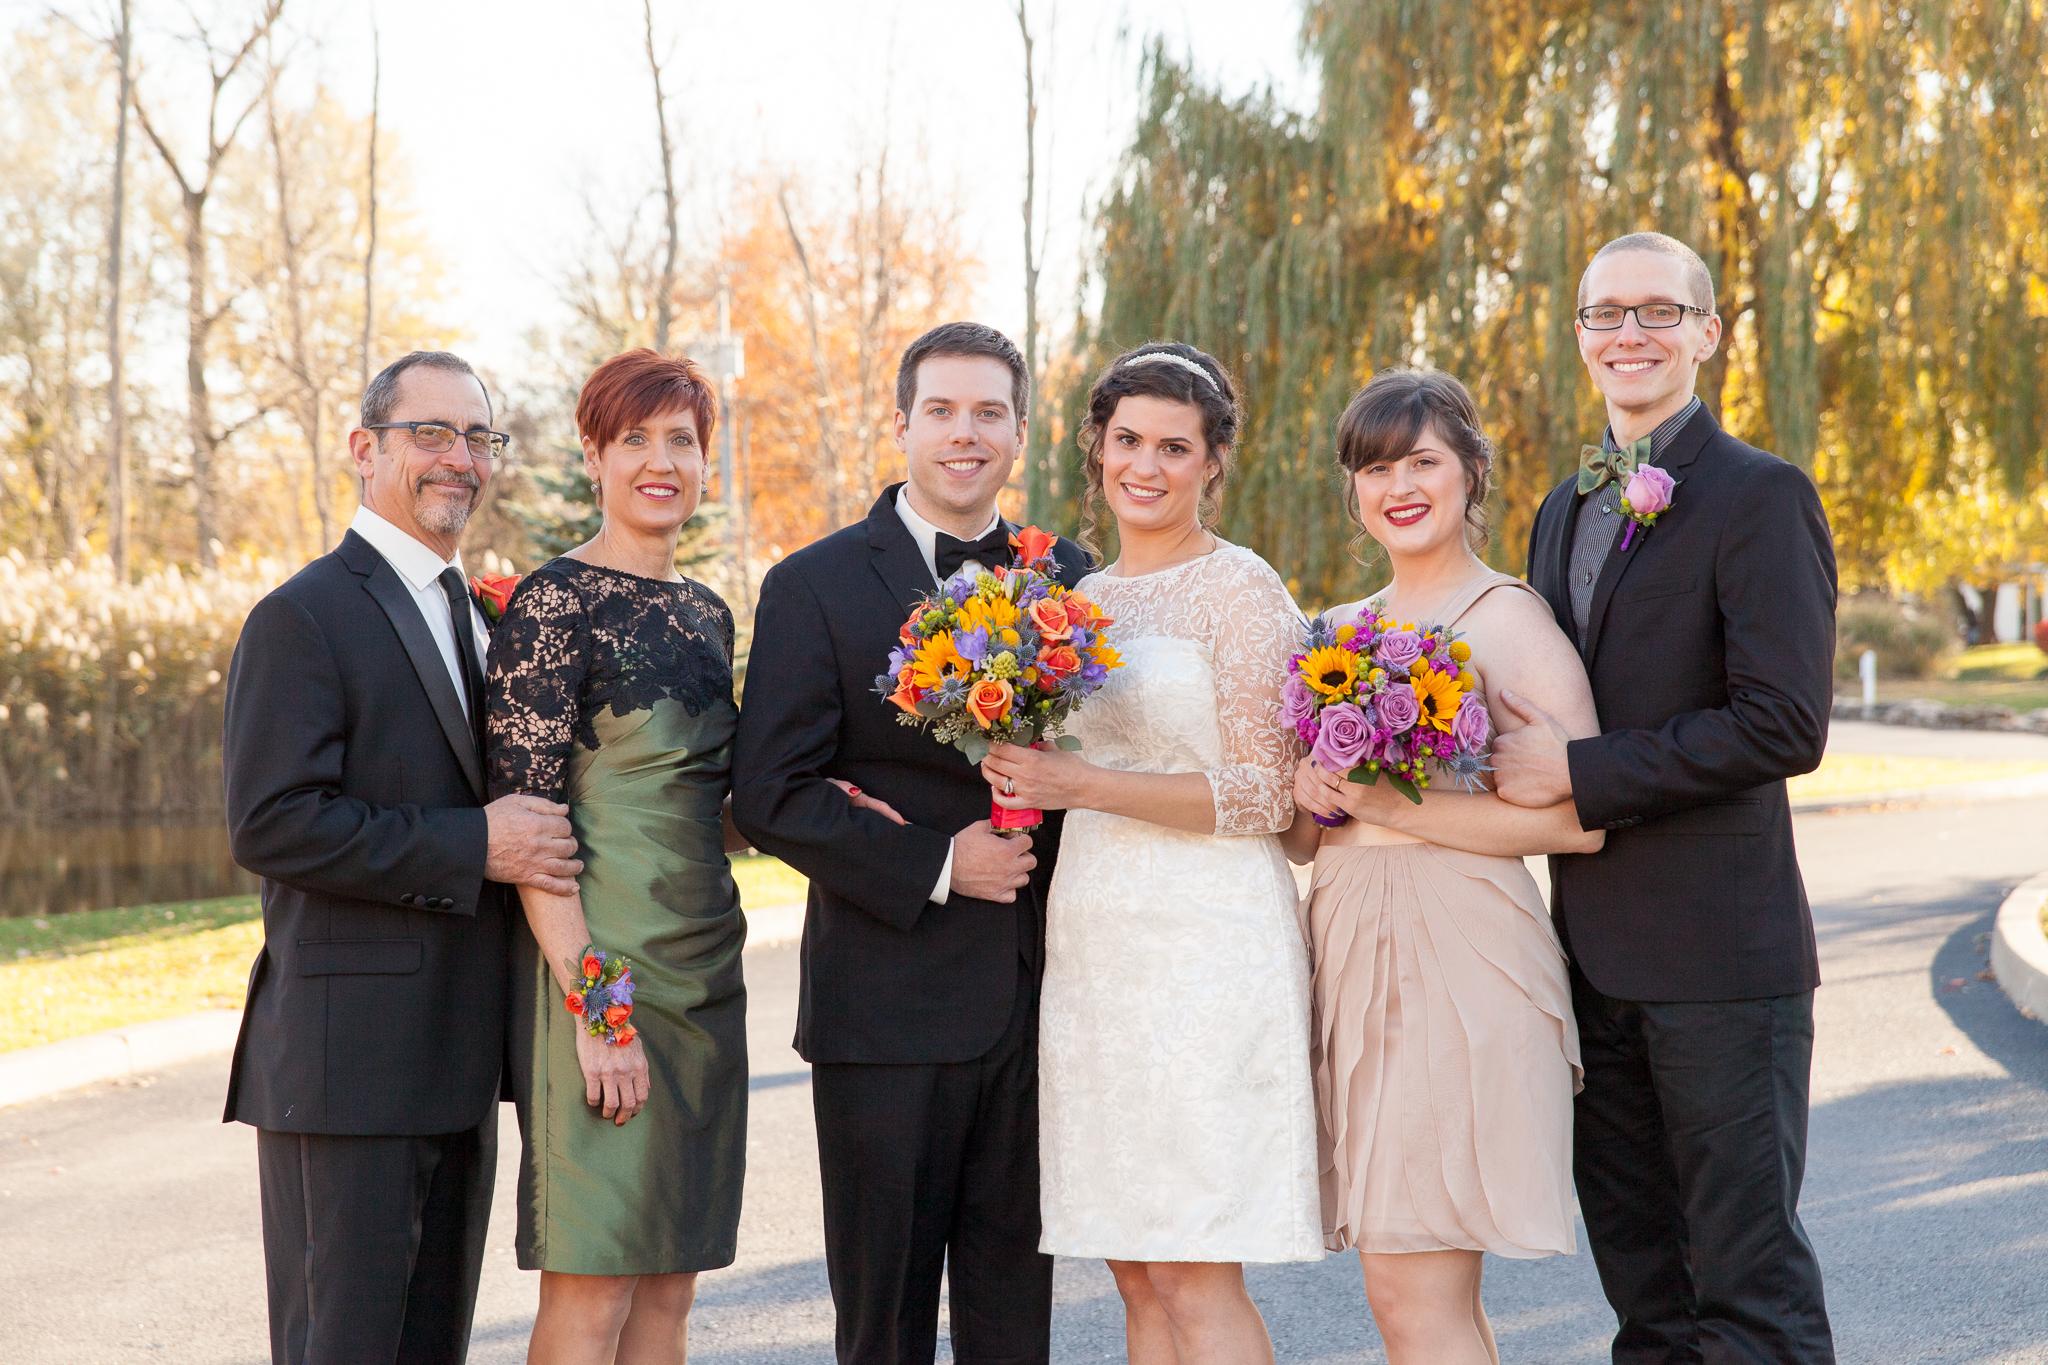 camuglia-whomstudio-chelsea_and_andy-nycphotographer-wedding-brooklyn-buffalo-timberlodge-026-0129.jpg